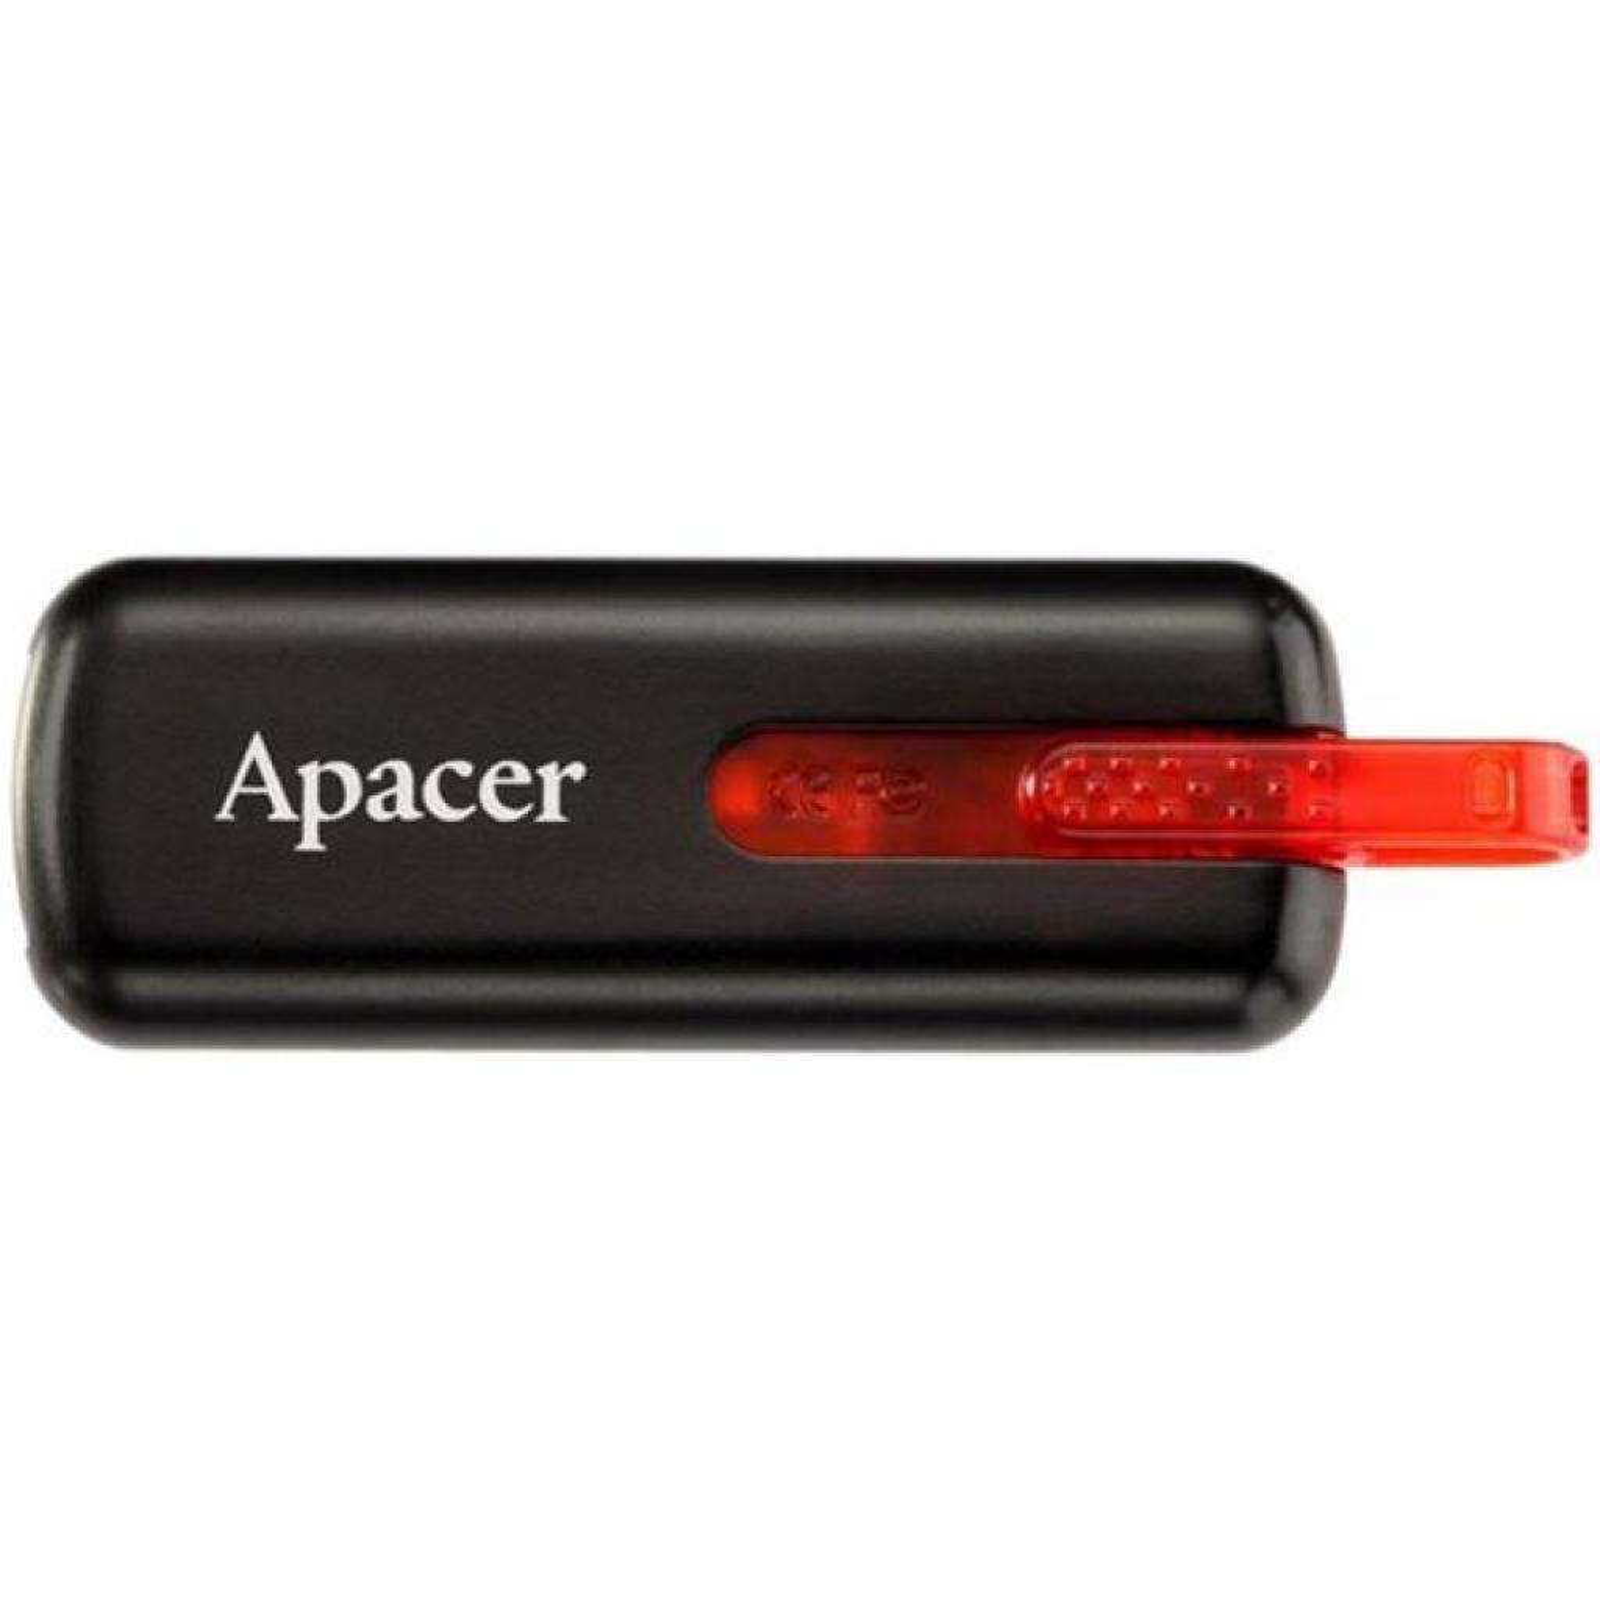 USB флеш накопитель Handy Steno AH326 black Apacer (AP8GAH326B-1) изображение 3